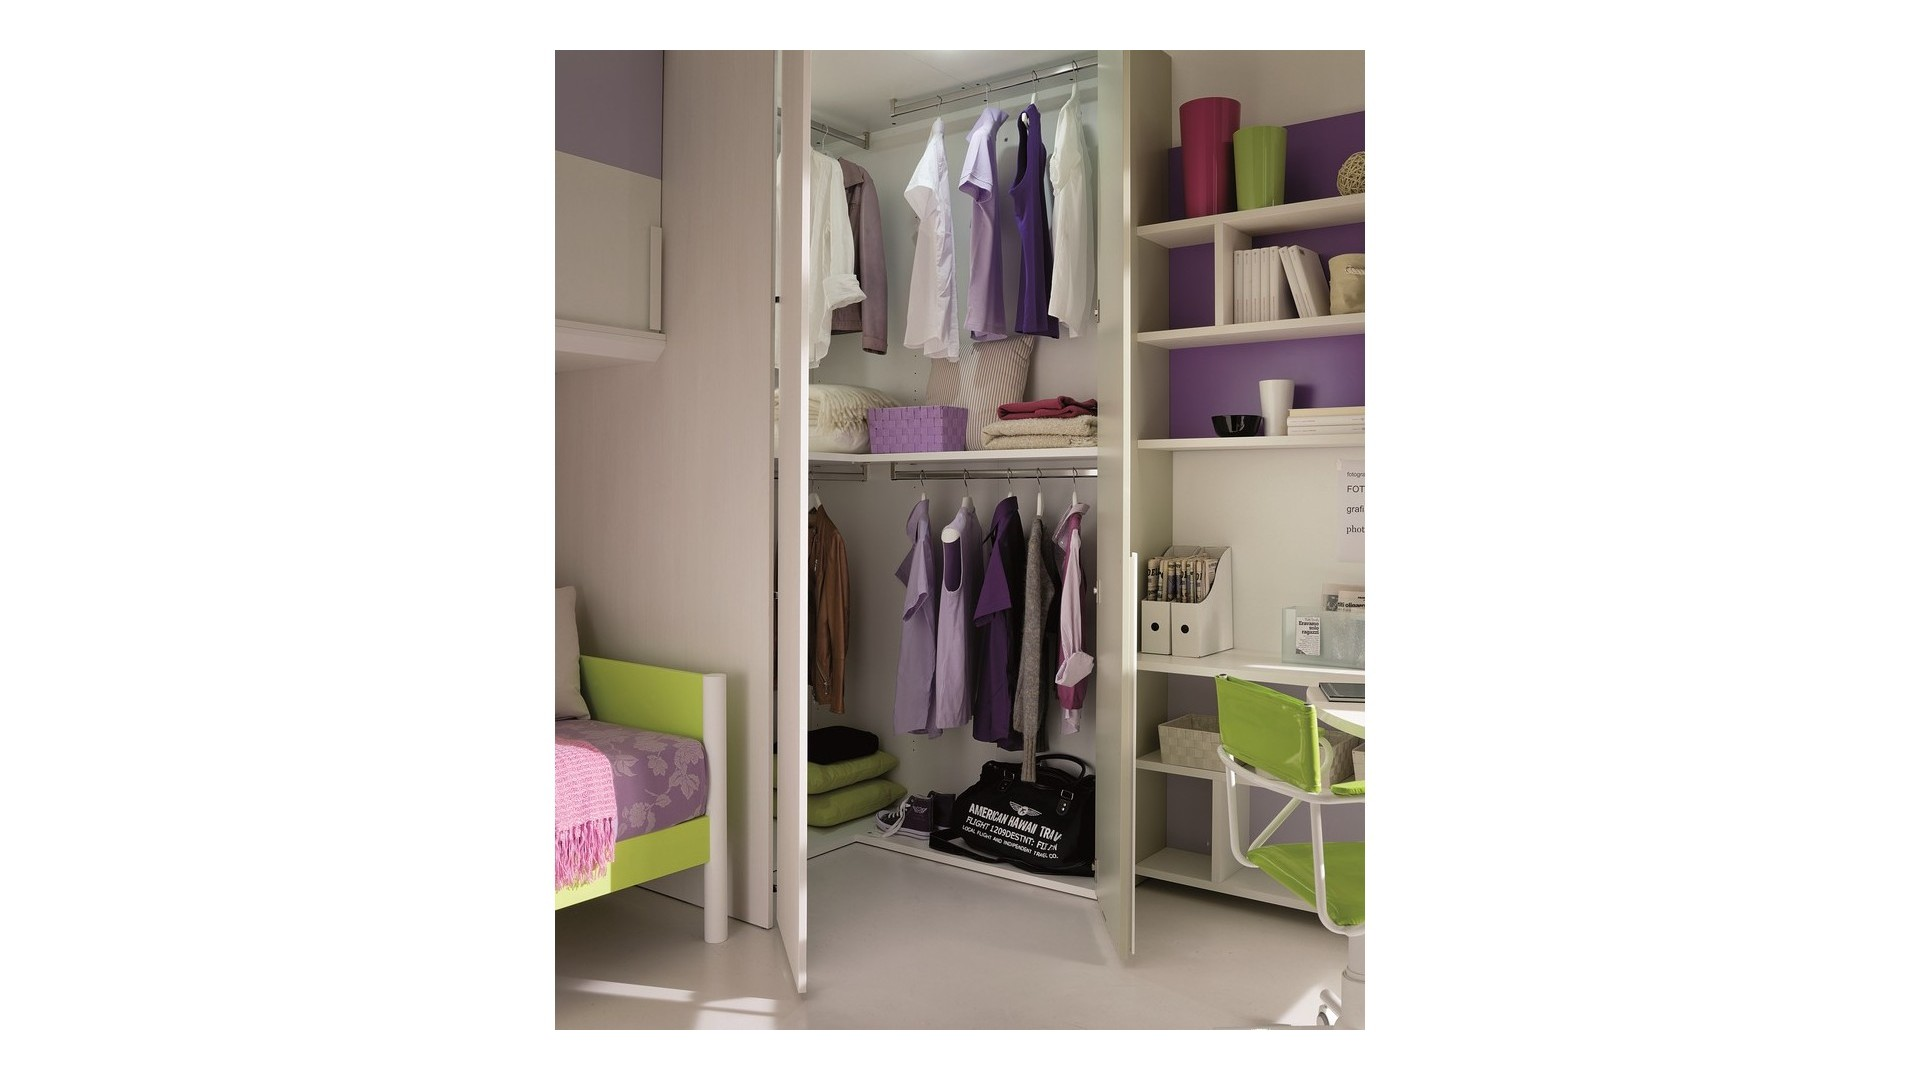 Cabine armadio modulari per camerette - Cabina armadio per cameretta ...